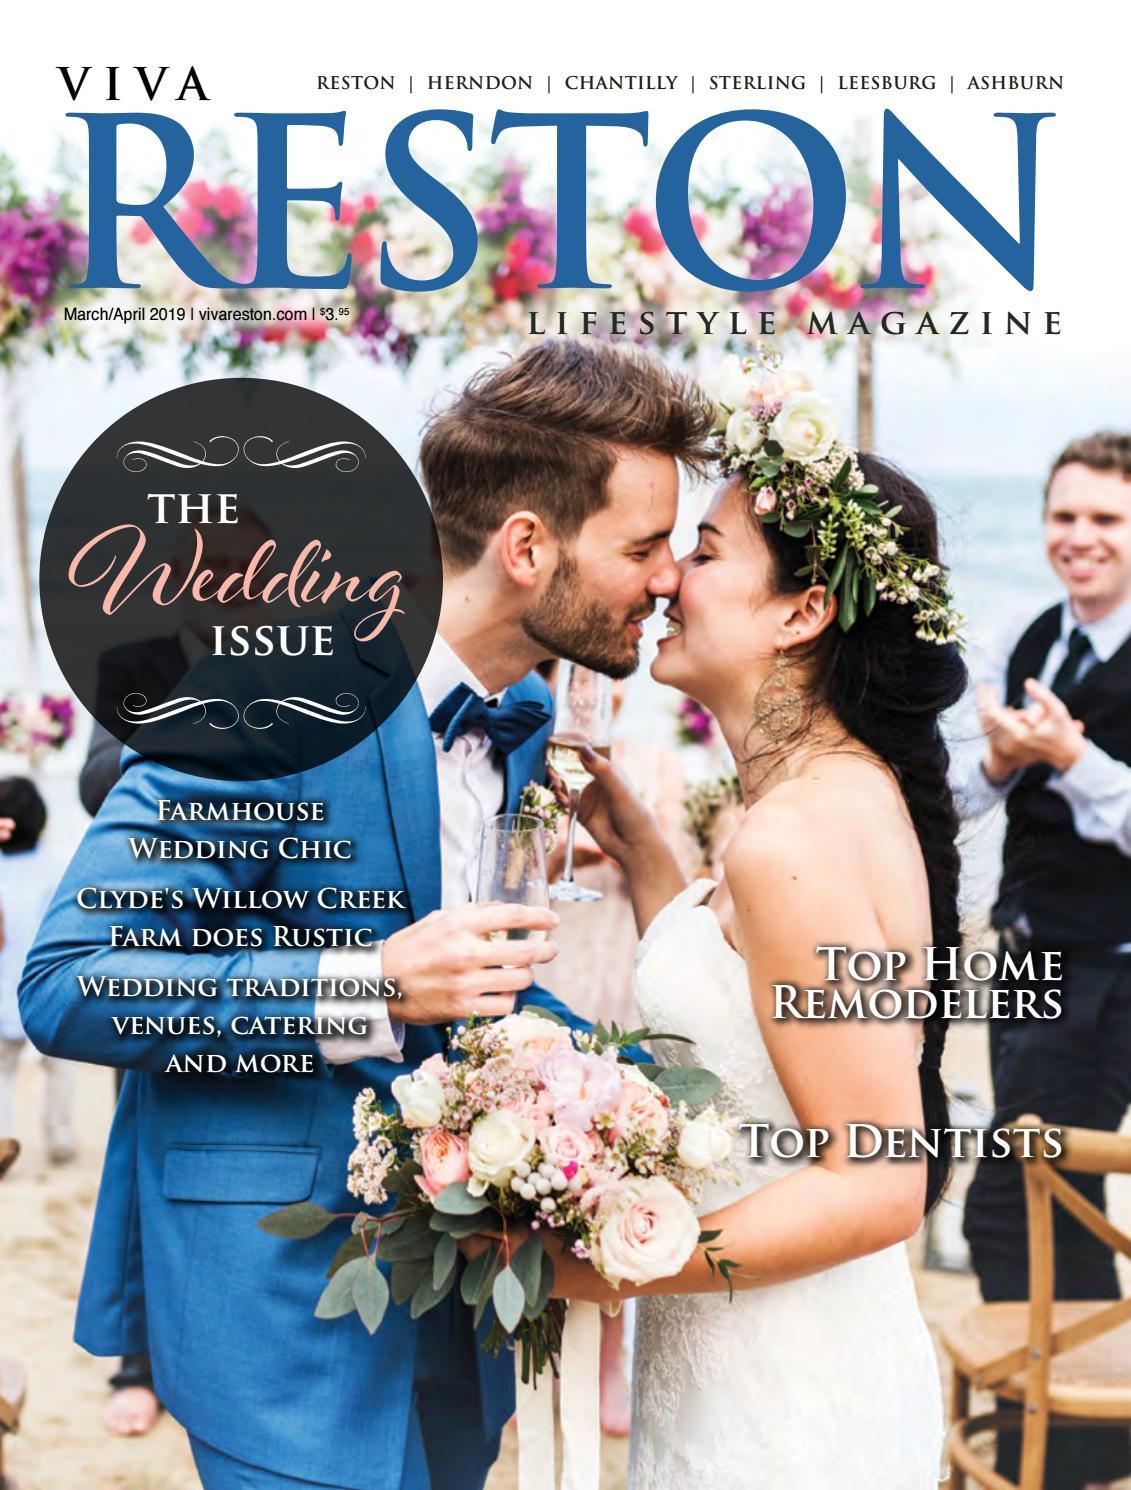 ae4ea49fa7bfb7c VivaReston Lifestyle Magazine | March-April 2019 by Johnny Hanna - issuu